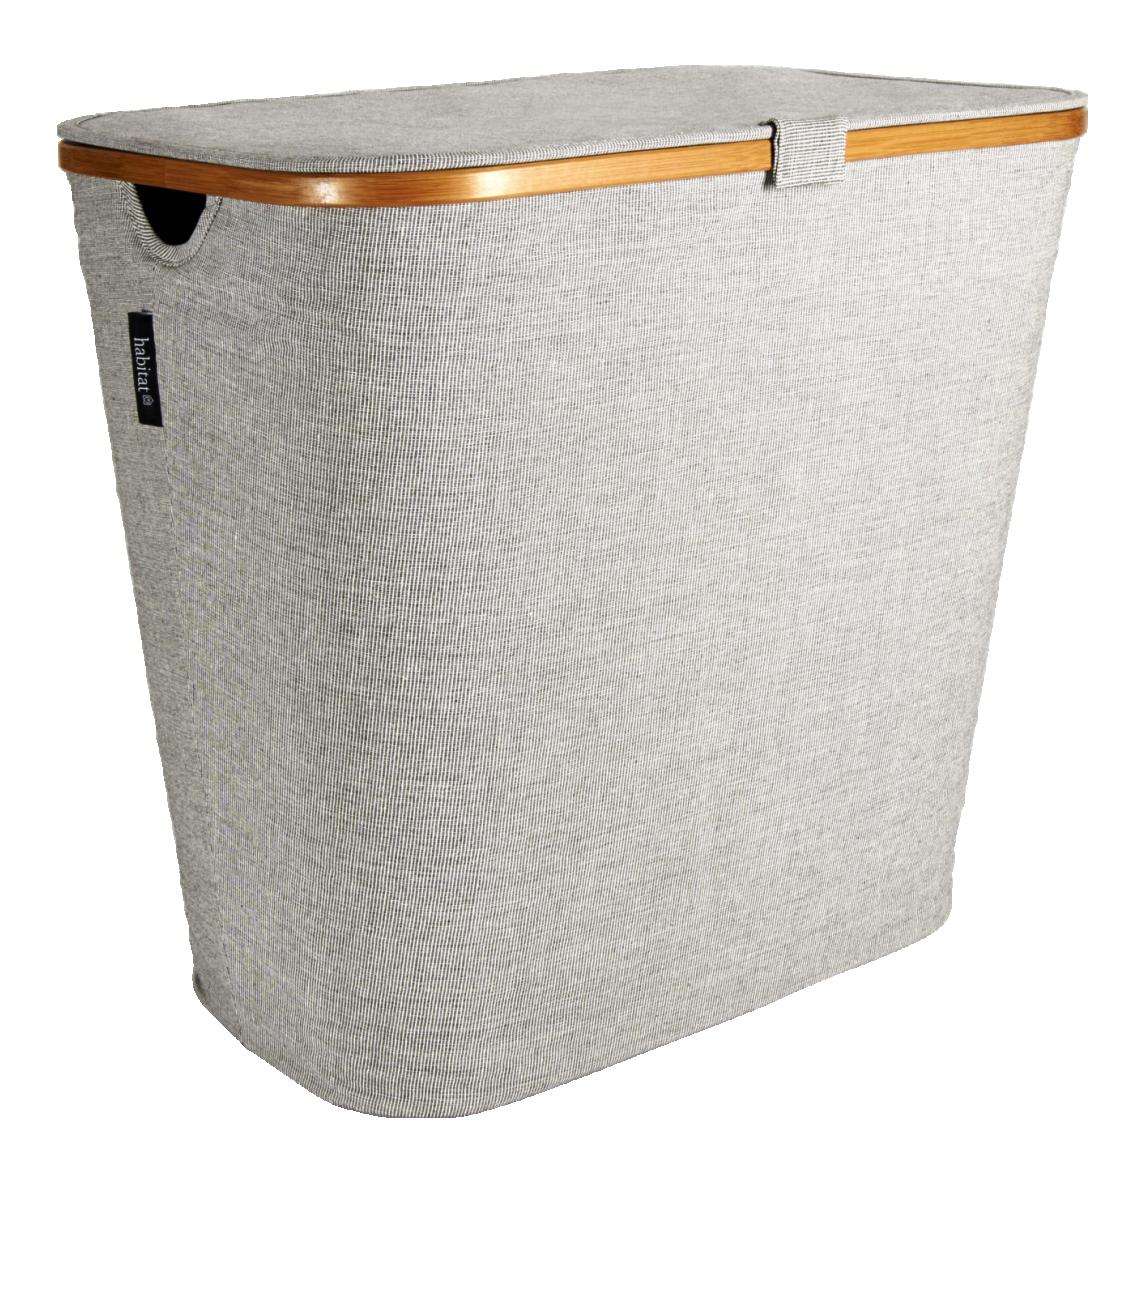 Barnabe Grand Panier A Linge En Toile Large Laundry Basket